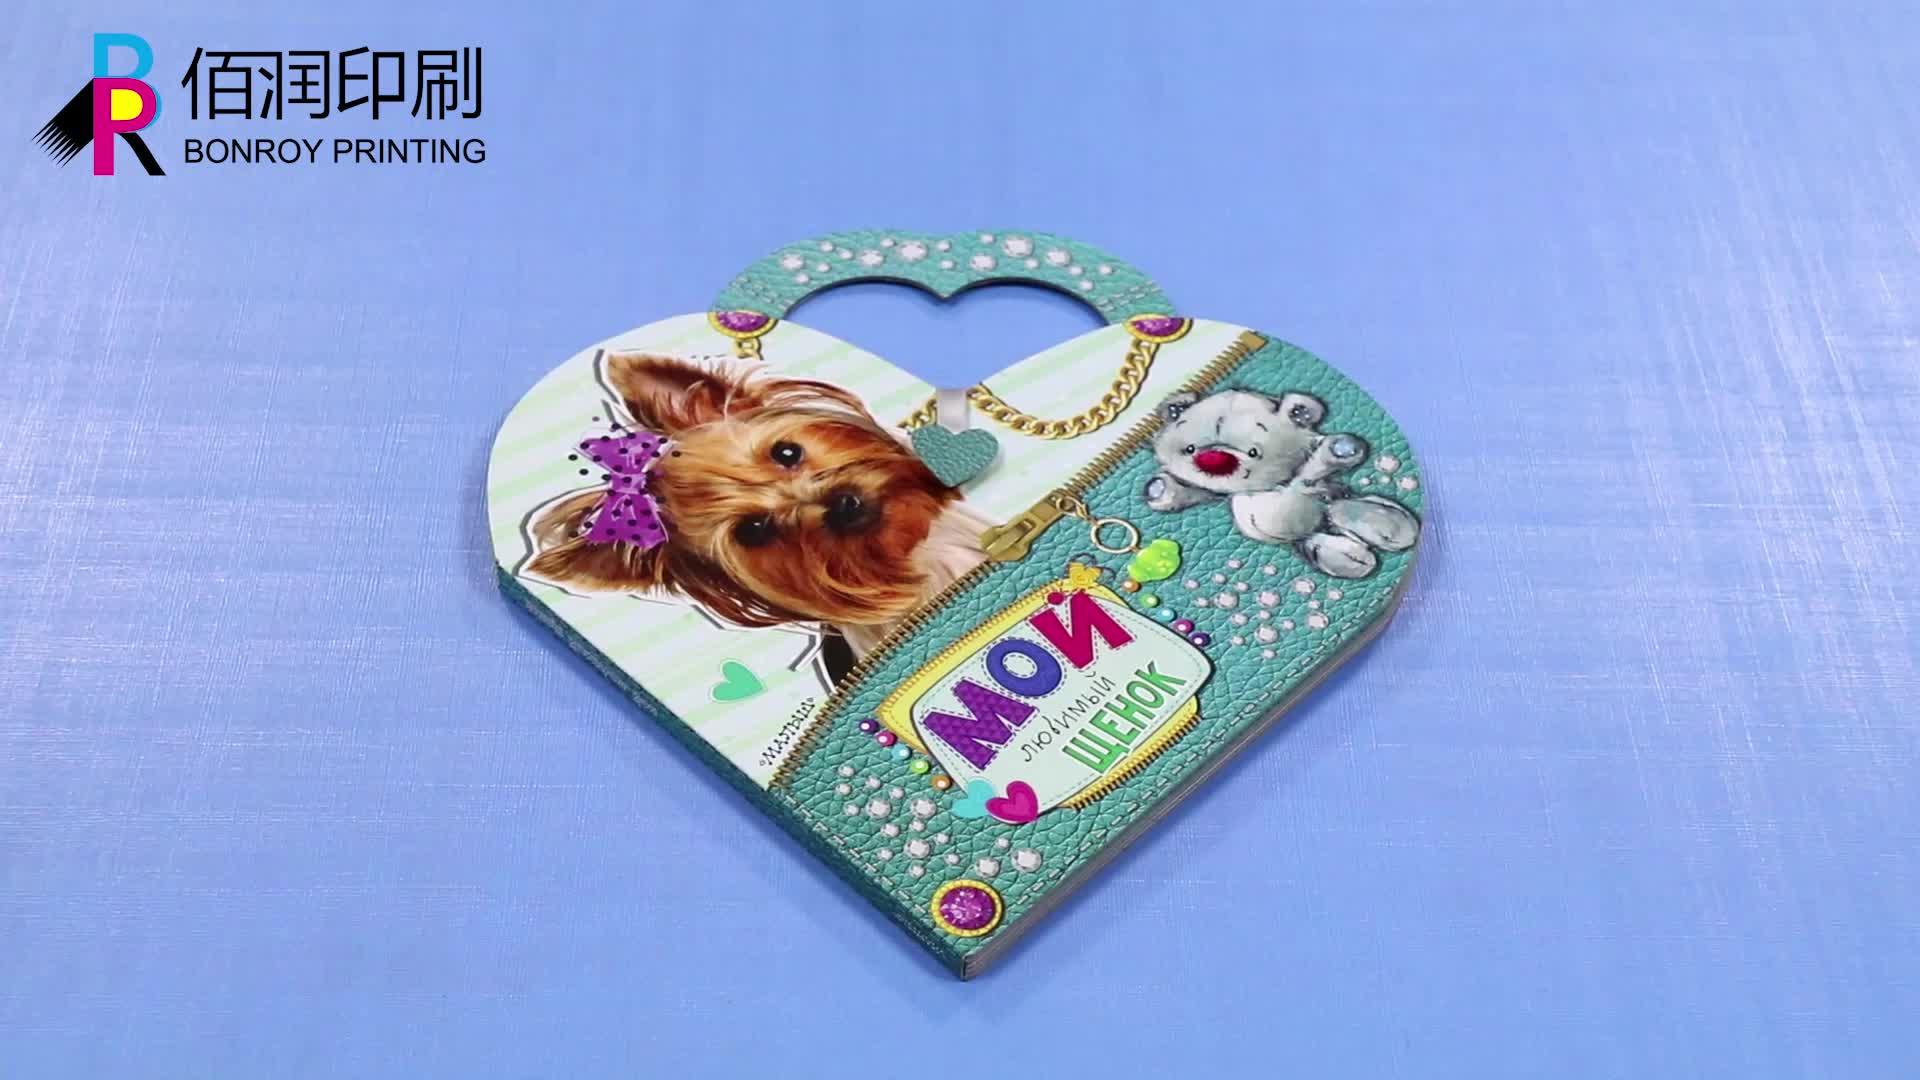 Custom Luxury Heart Shape เกสต์งานแต่งงานอัลบั้มรูปกระดาษแข็งหนังสือพิมพ์